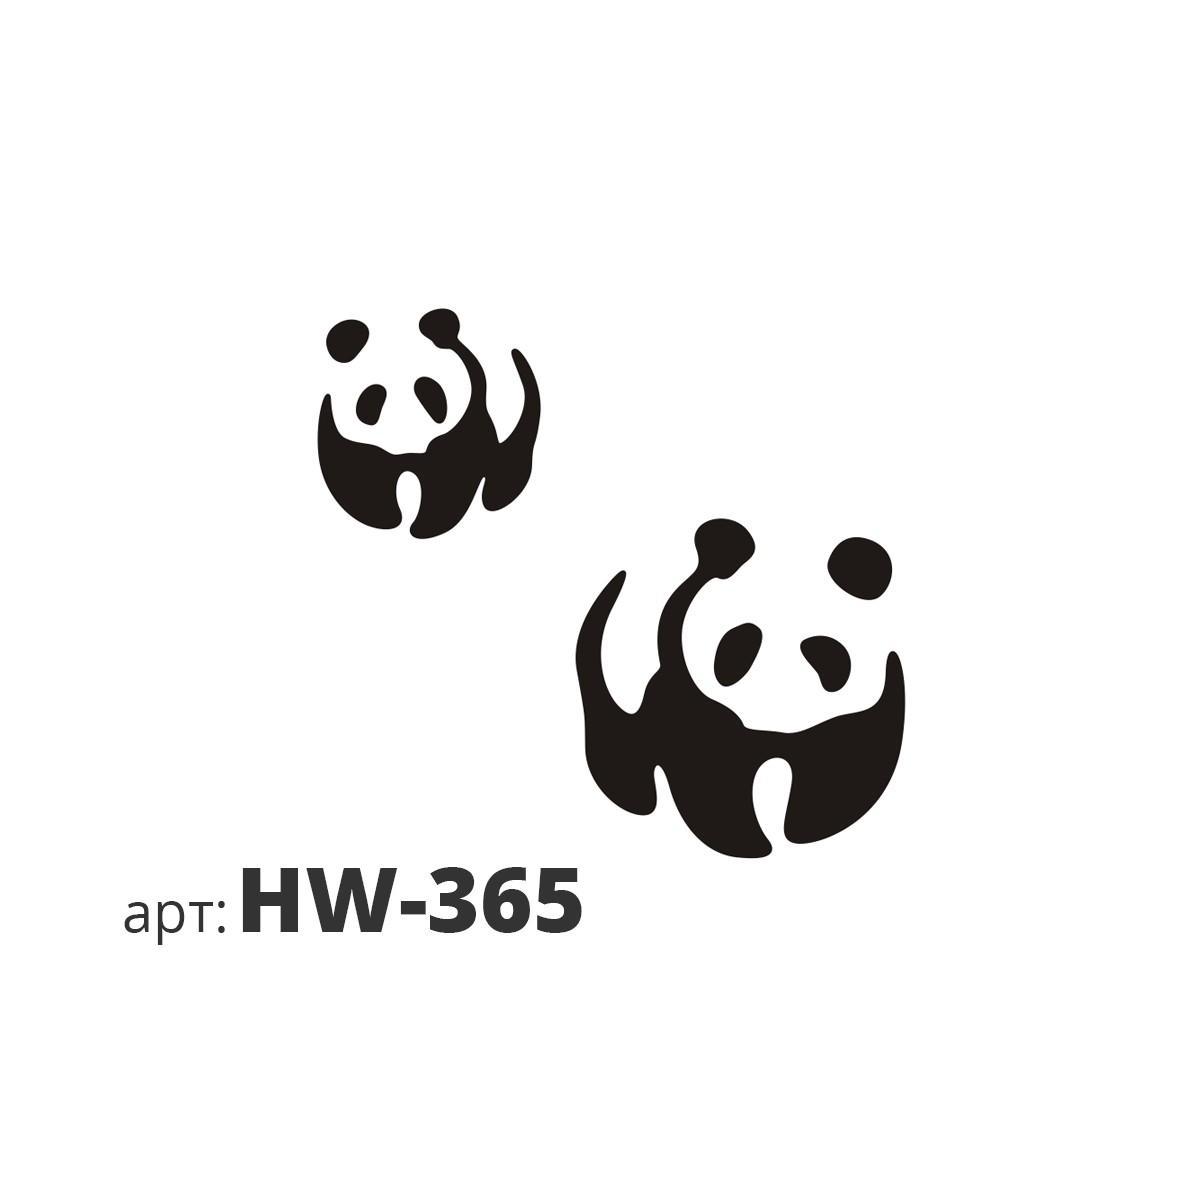 Трафарет виниловый ПАНДА HW-365